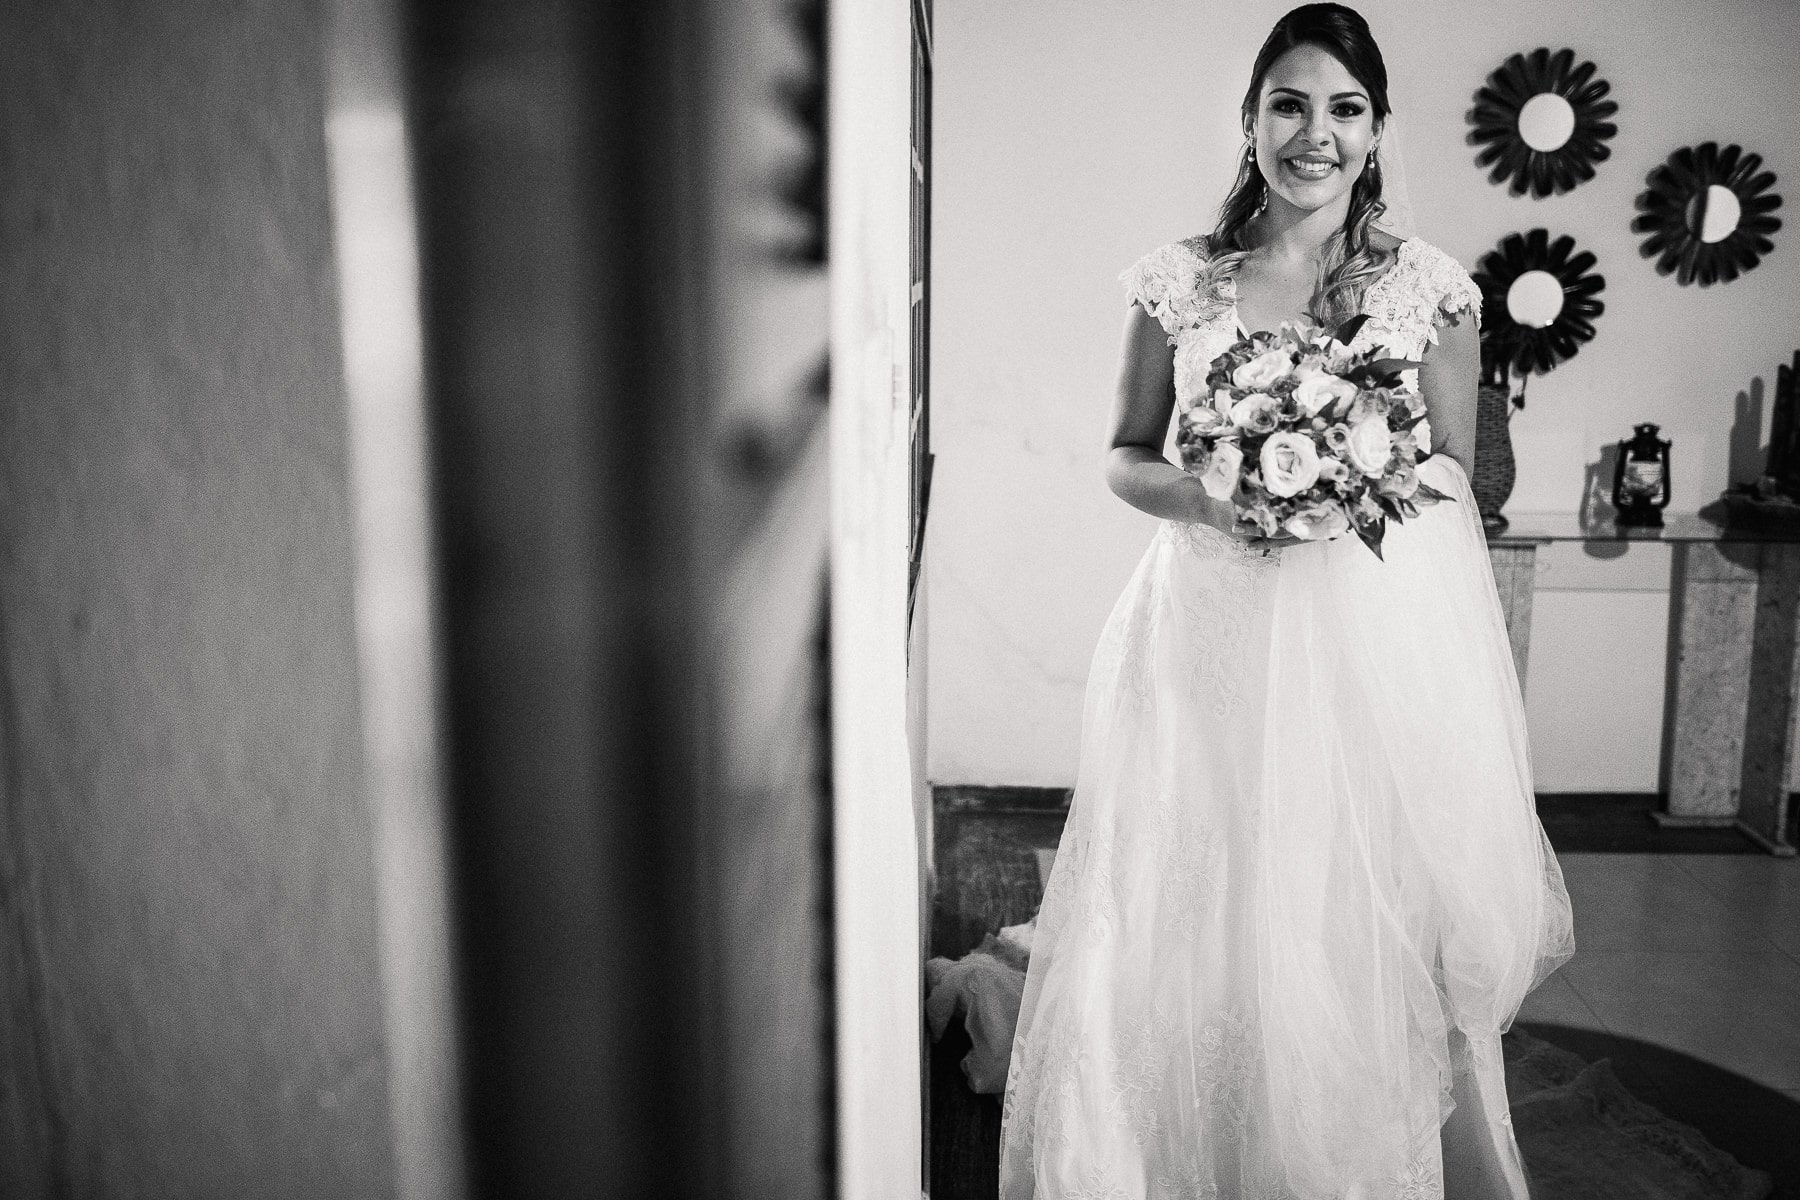 casamento-sitio-serra-guaramiranga-22